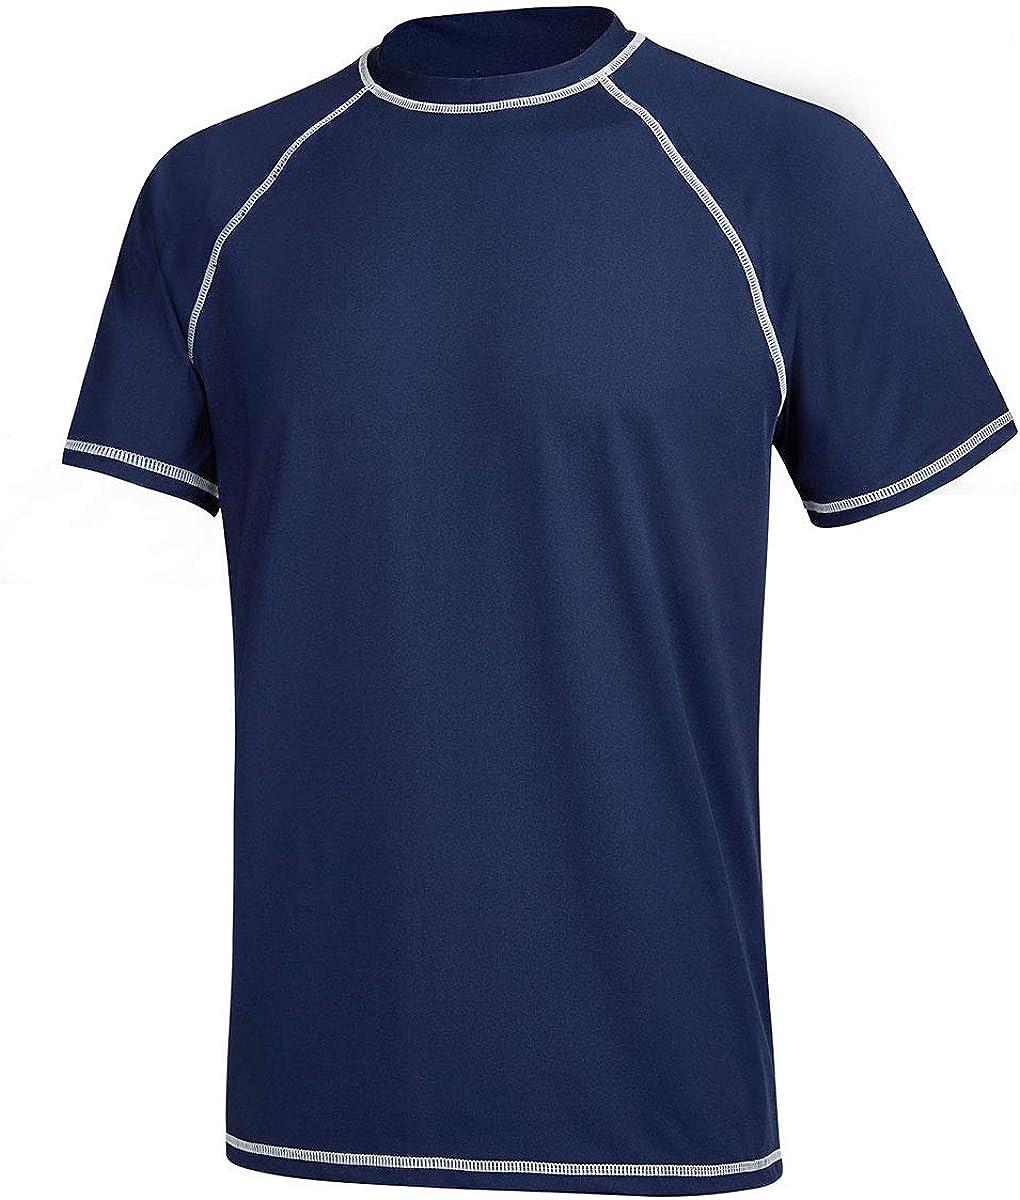 Satankud Men's UPF 50+ Rashguard Swim Tee Short Sleeve Running Shirt Swimwear Swim Hiking Workout Shirts: Clothing